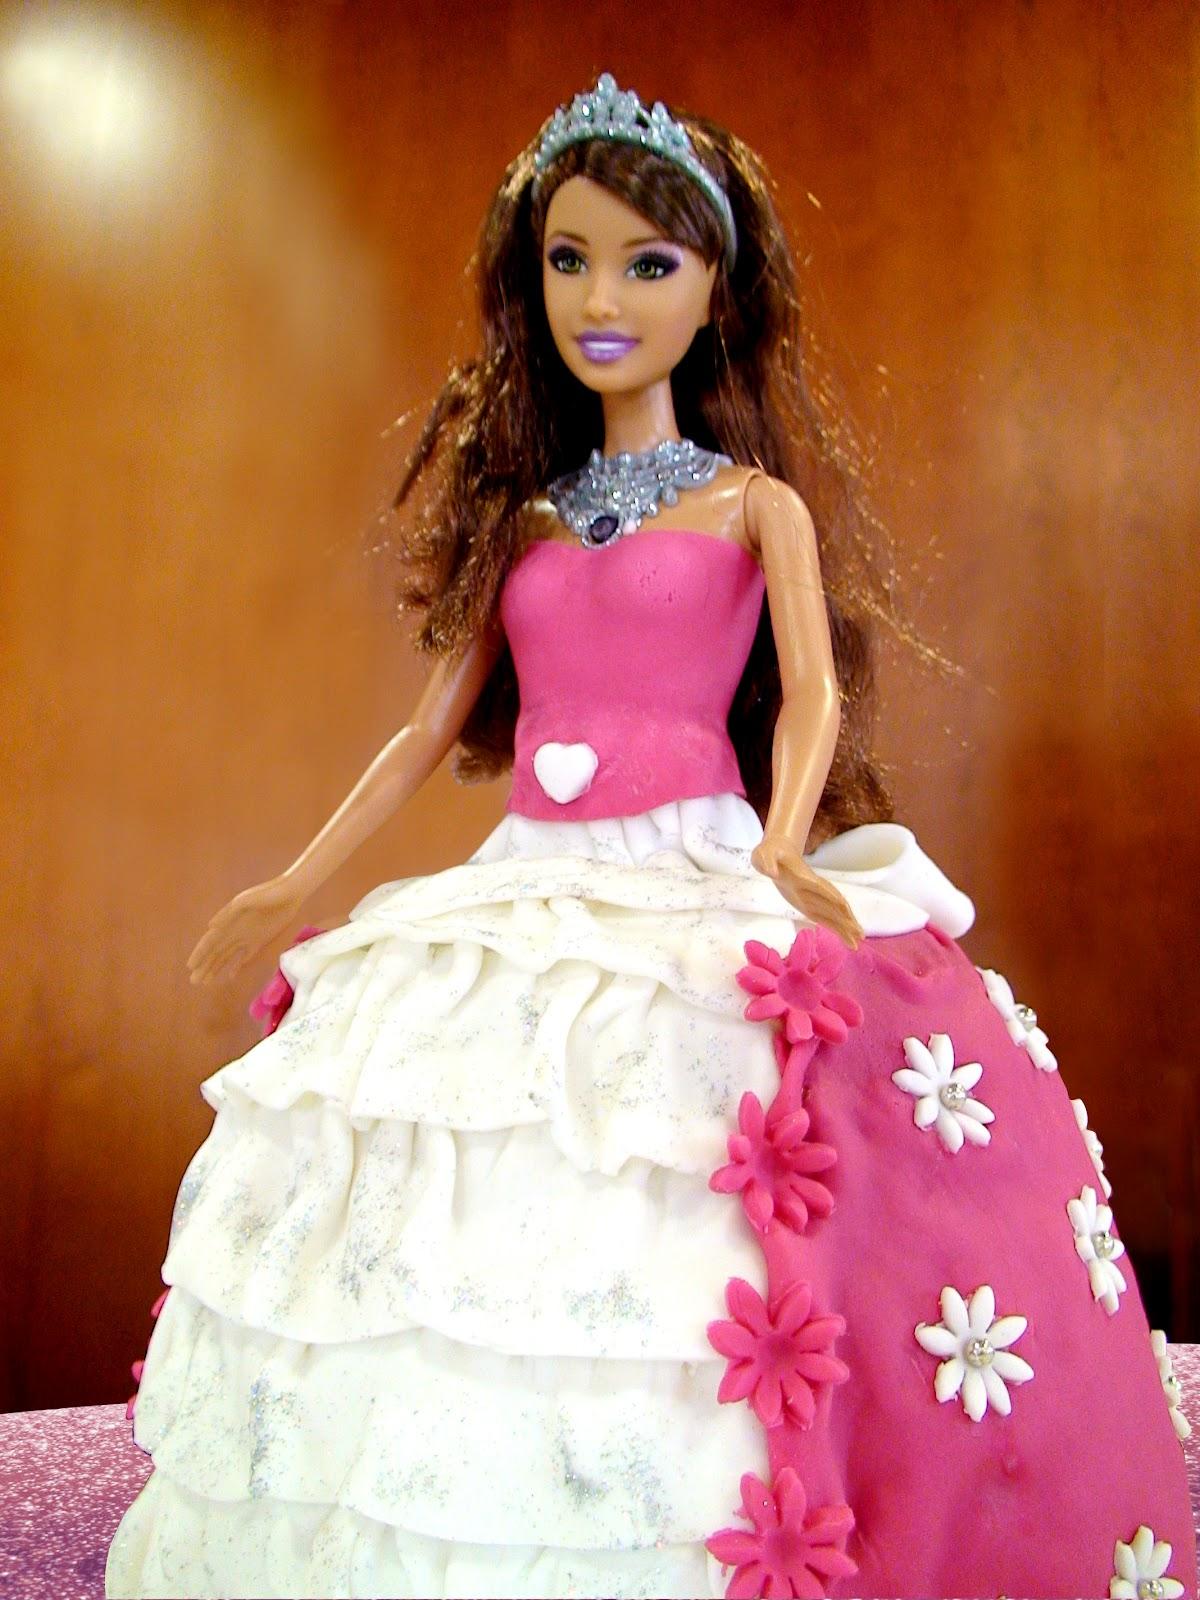 pastis fondant,Barbie